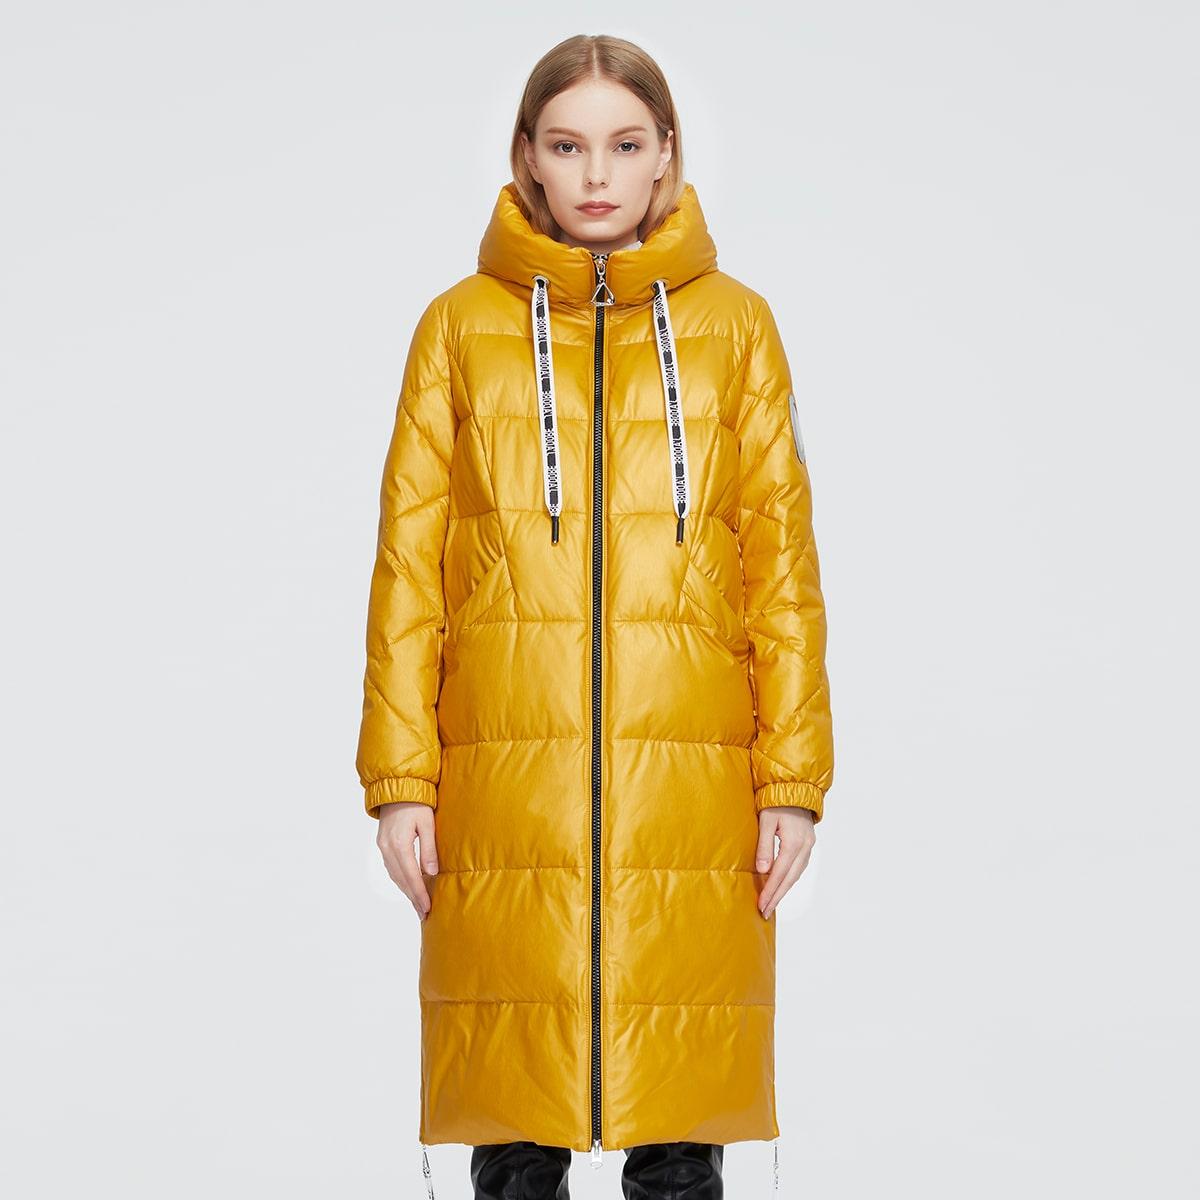 Zip Up Pocket Detail Drawstring Hooded Puffer Coat